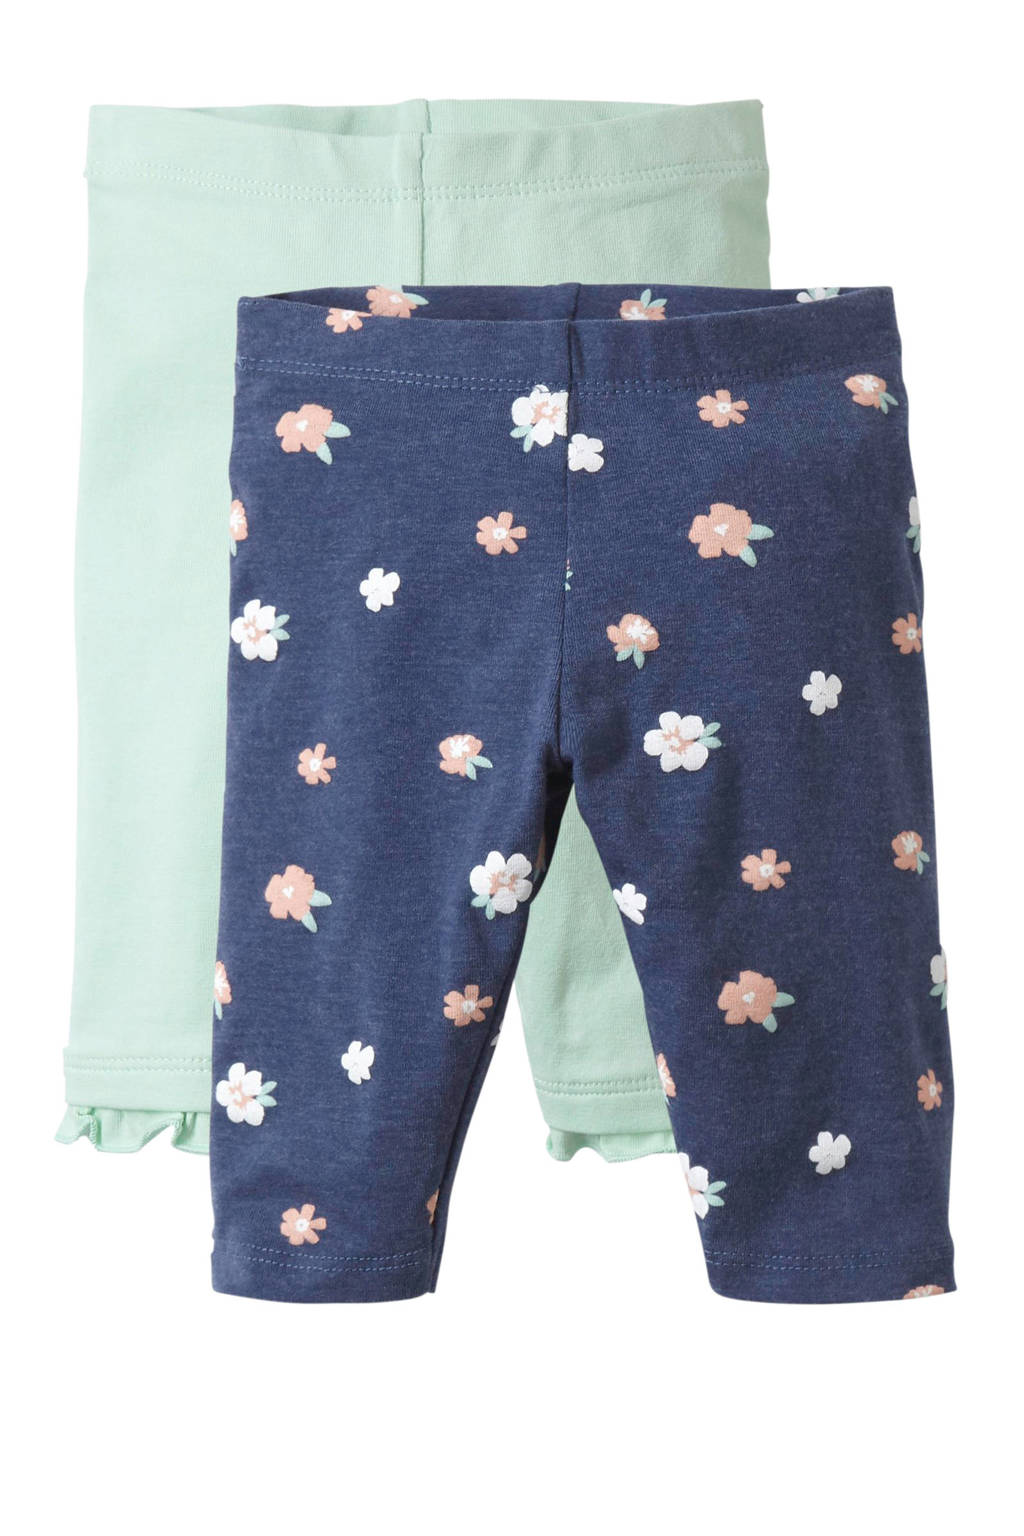 C&A Baby Club legging - set van 2, Mintgroen/blauw